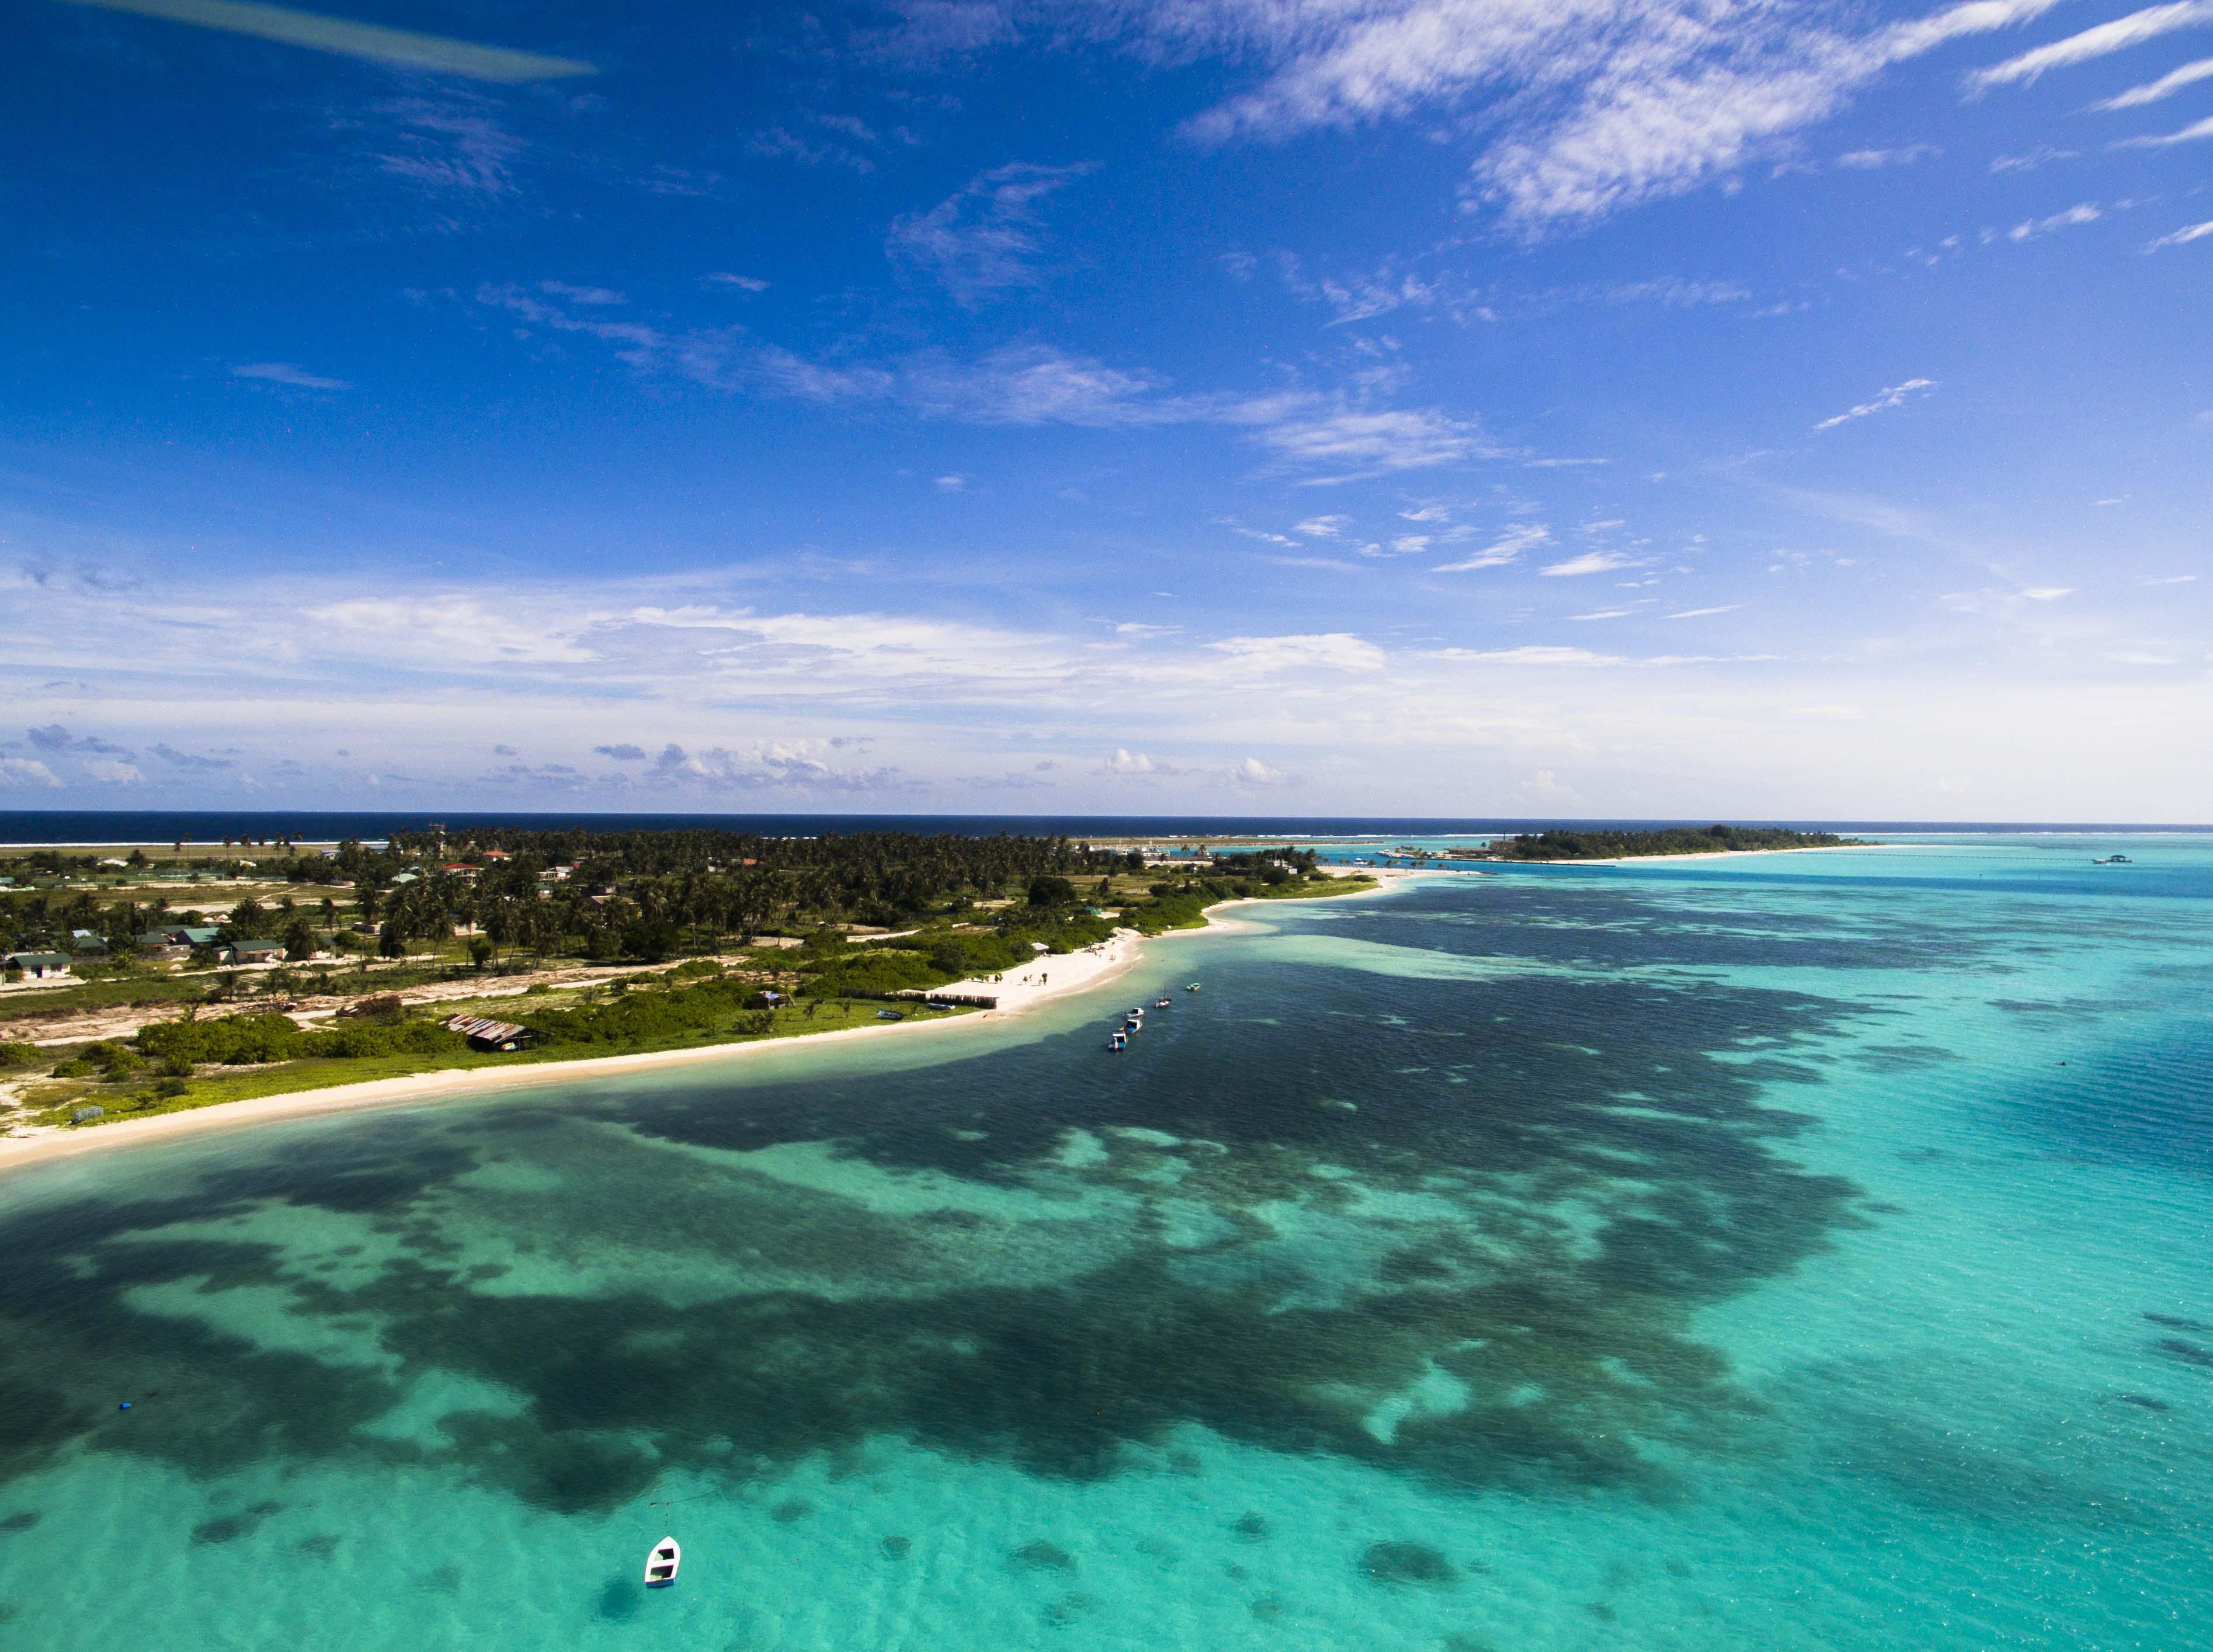 Lacabana Maldives  A Dh Maamigili Island (18)